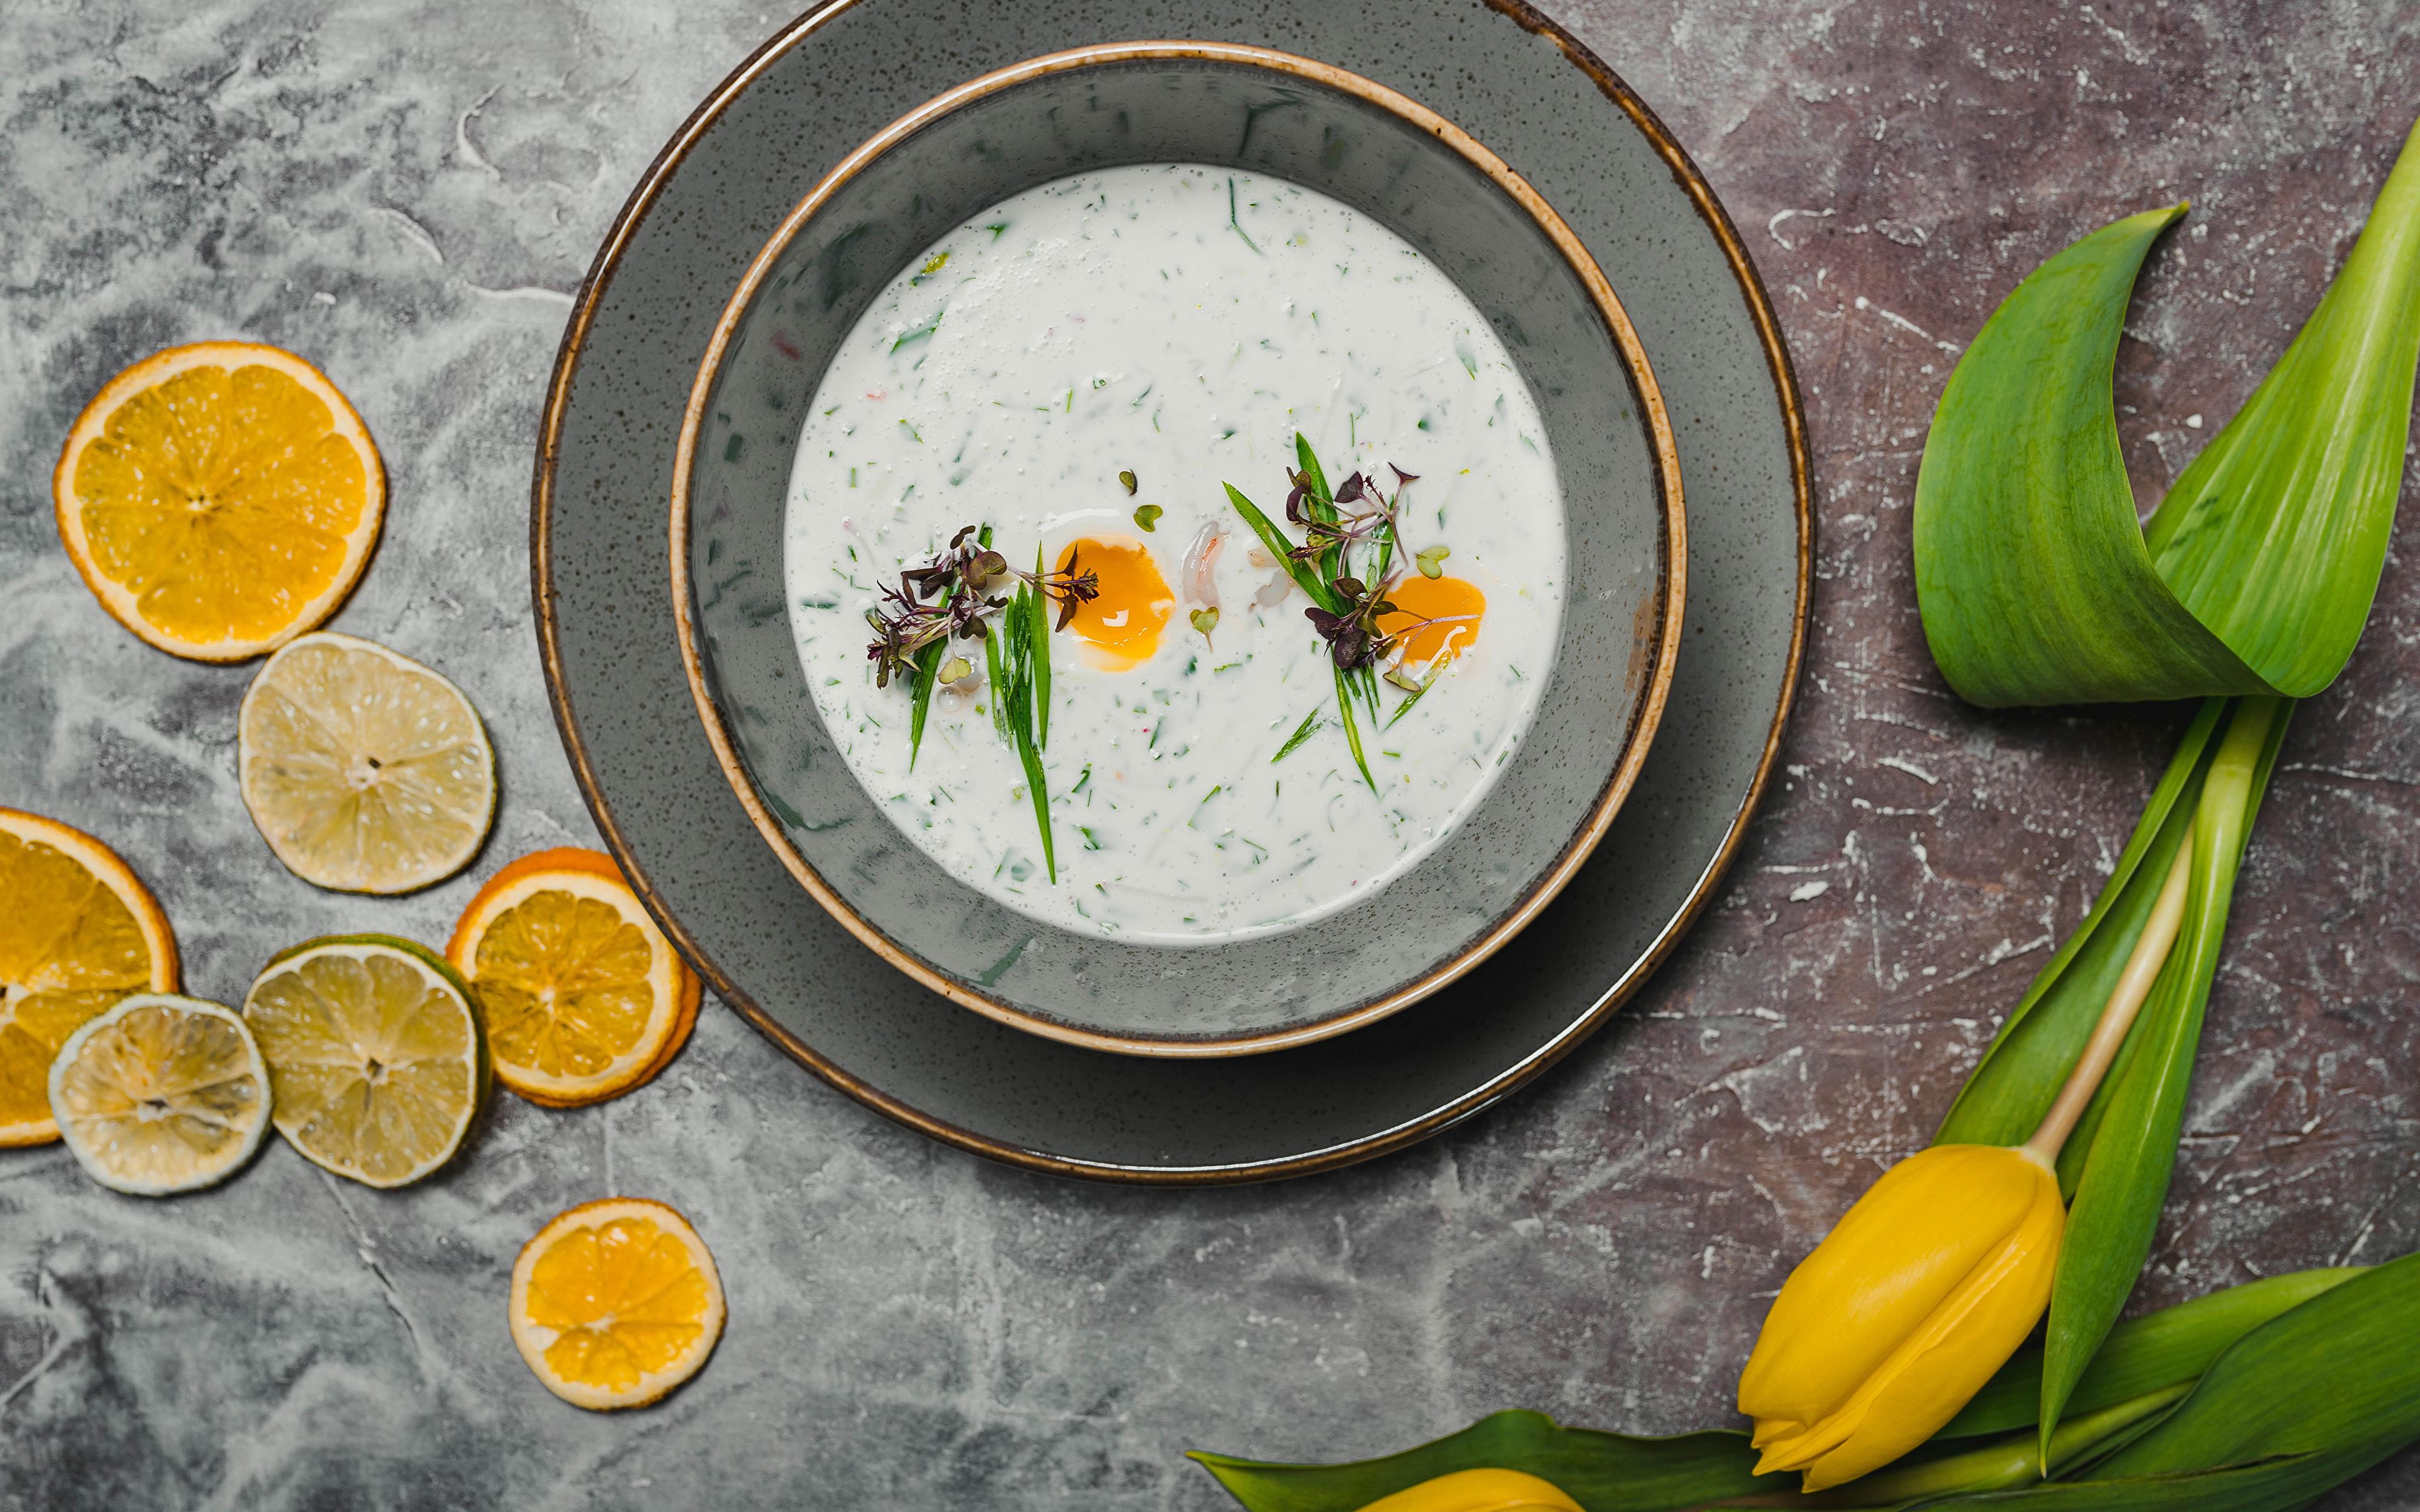 Фото тюльпан Цветы Лимоны Еда Супы Тарелка 3840x2400 Тюльпаны цветок Пища тарелке Продукты питания